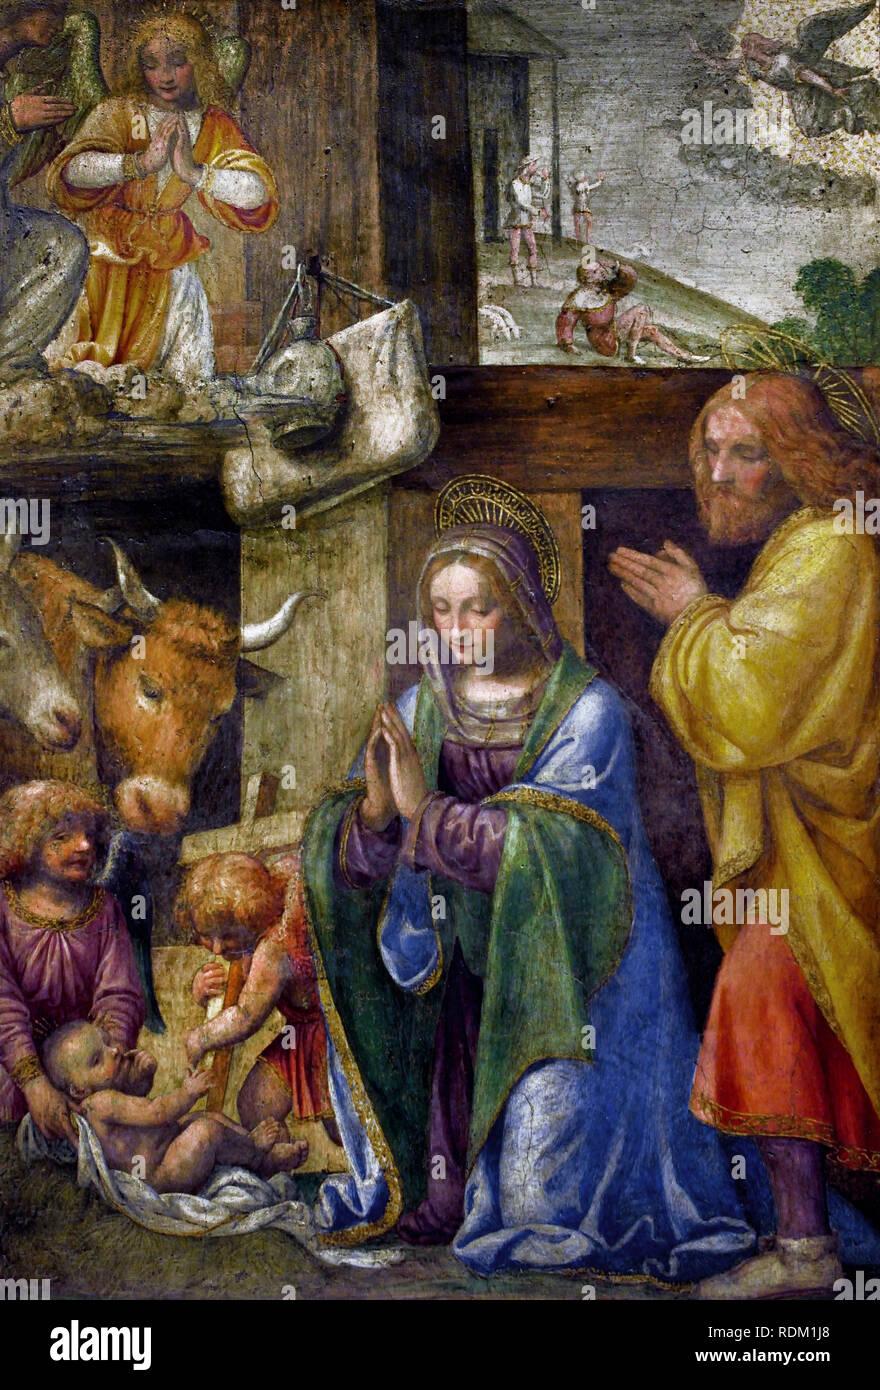 Nativity and the announcement to the shepherds by, Bernardino LUINI, 1485 - 1532, Italy, Italian, (fresco) - Stock Image